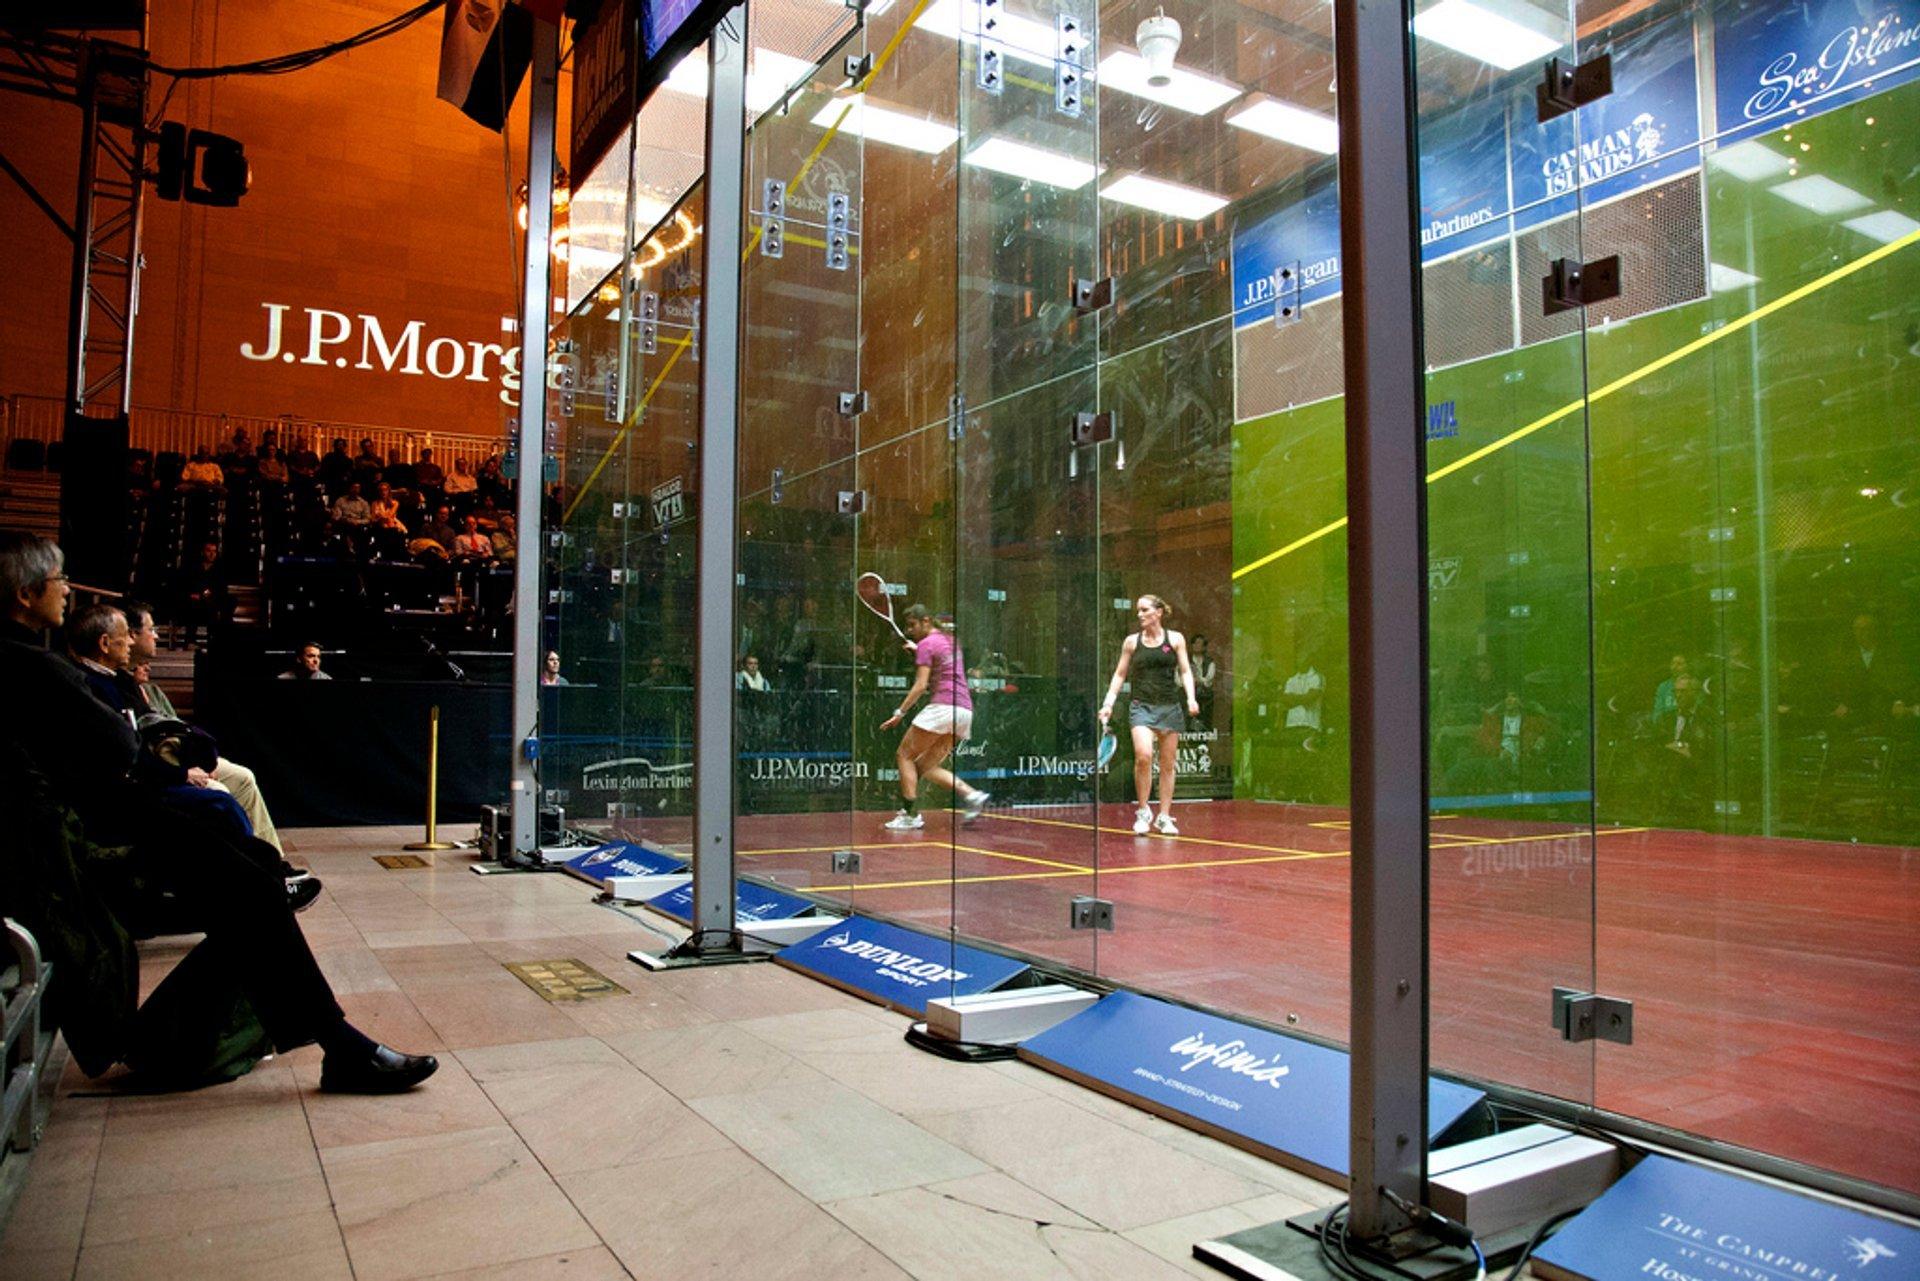 Tournament of Champions Squash in New York - Best Season 2020